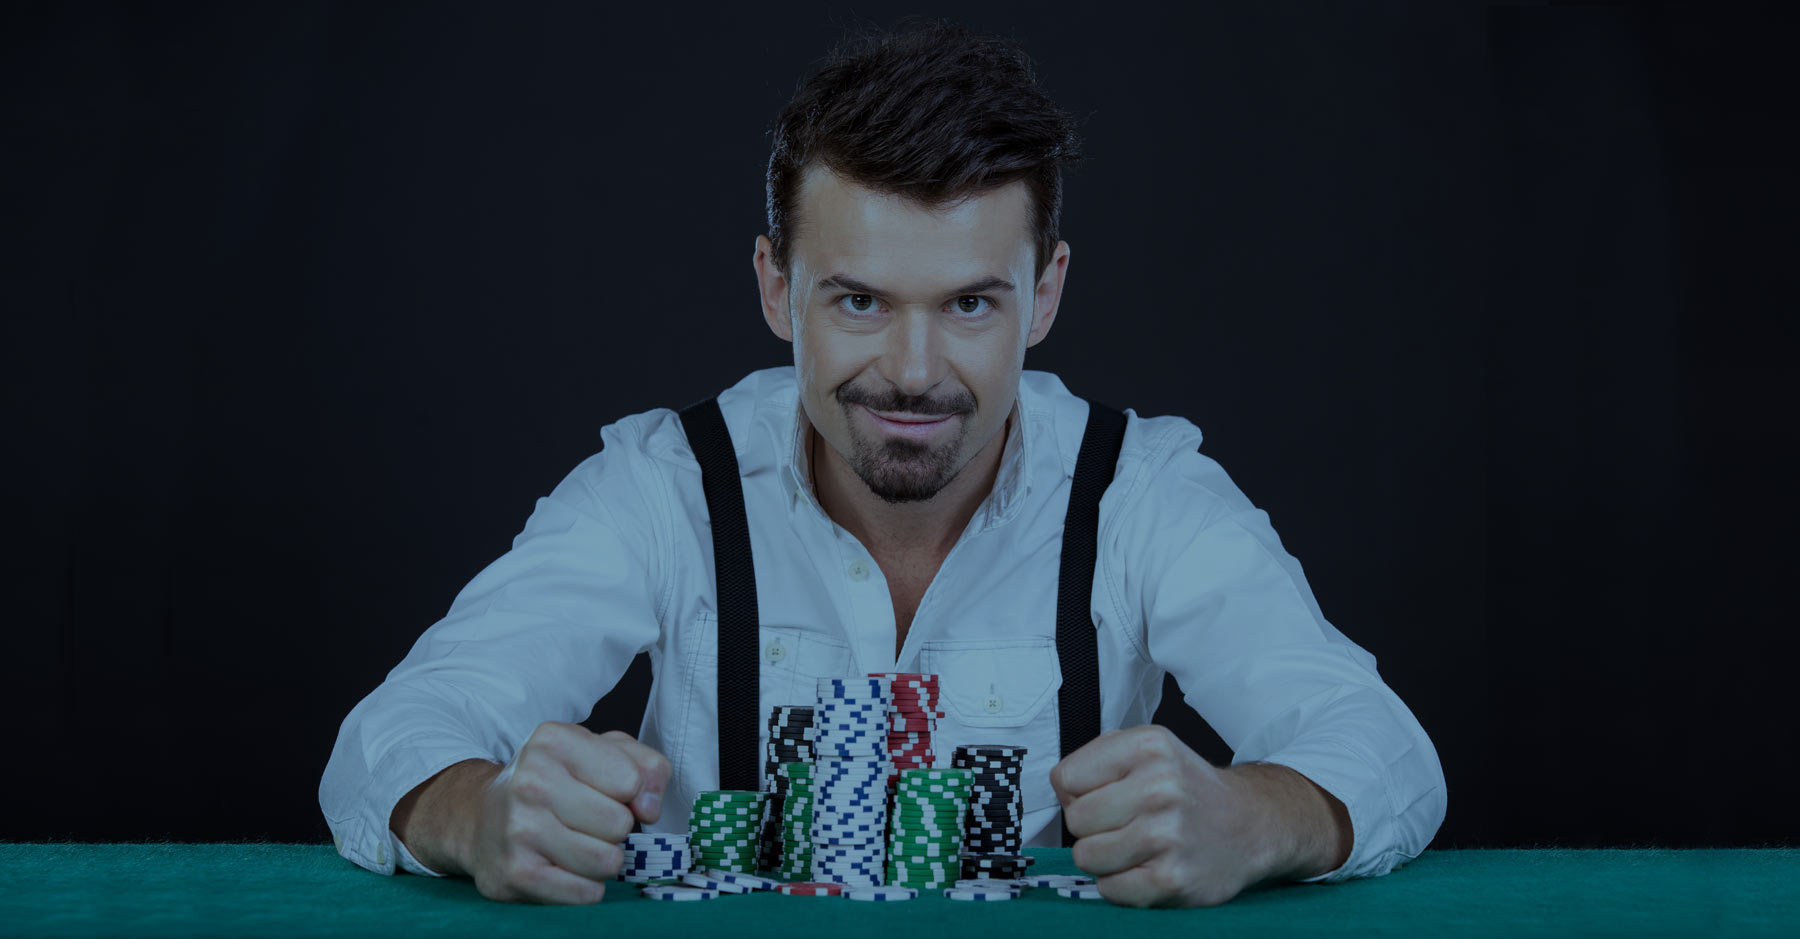 Sky poker mobile